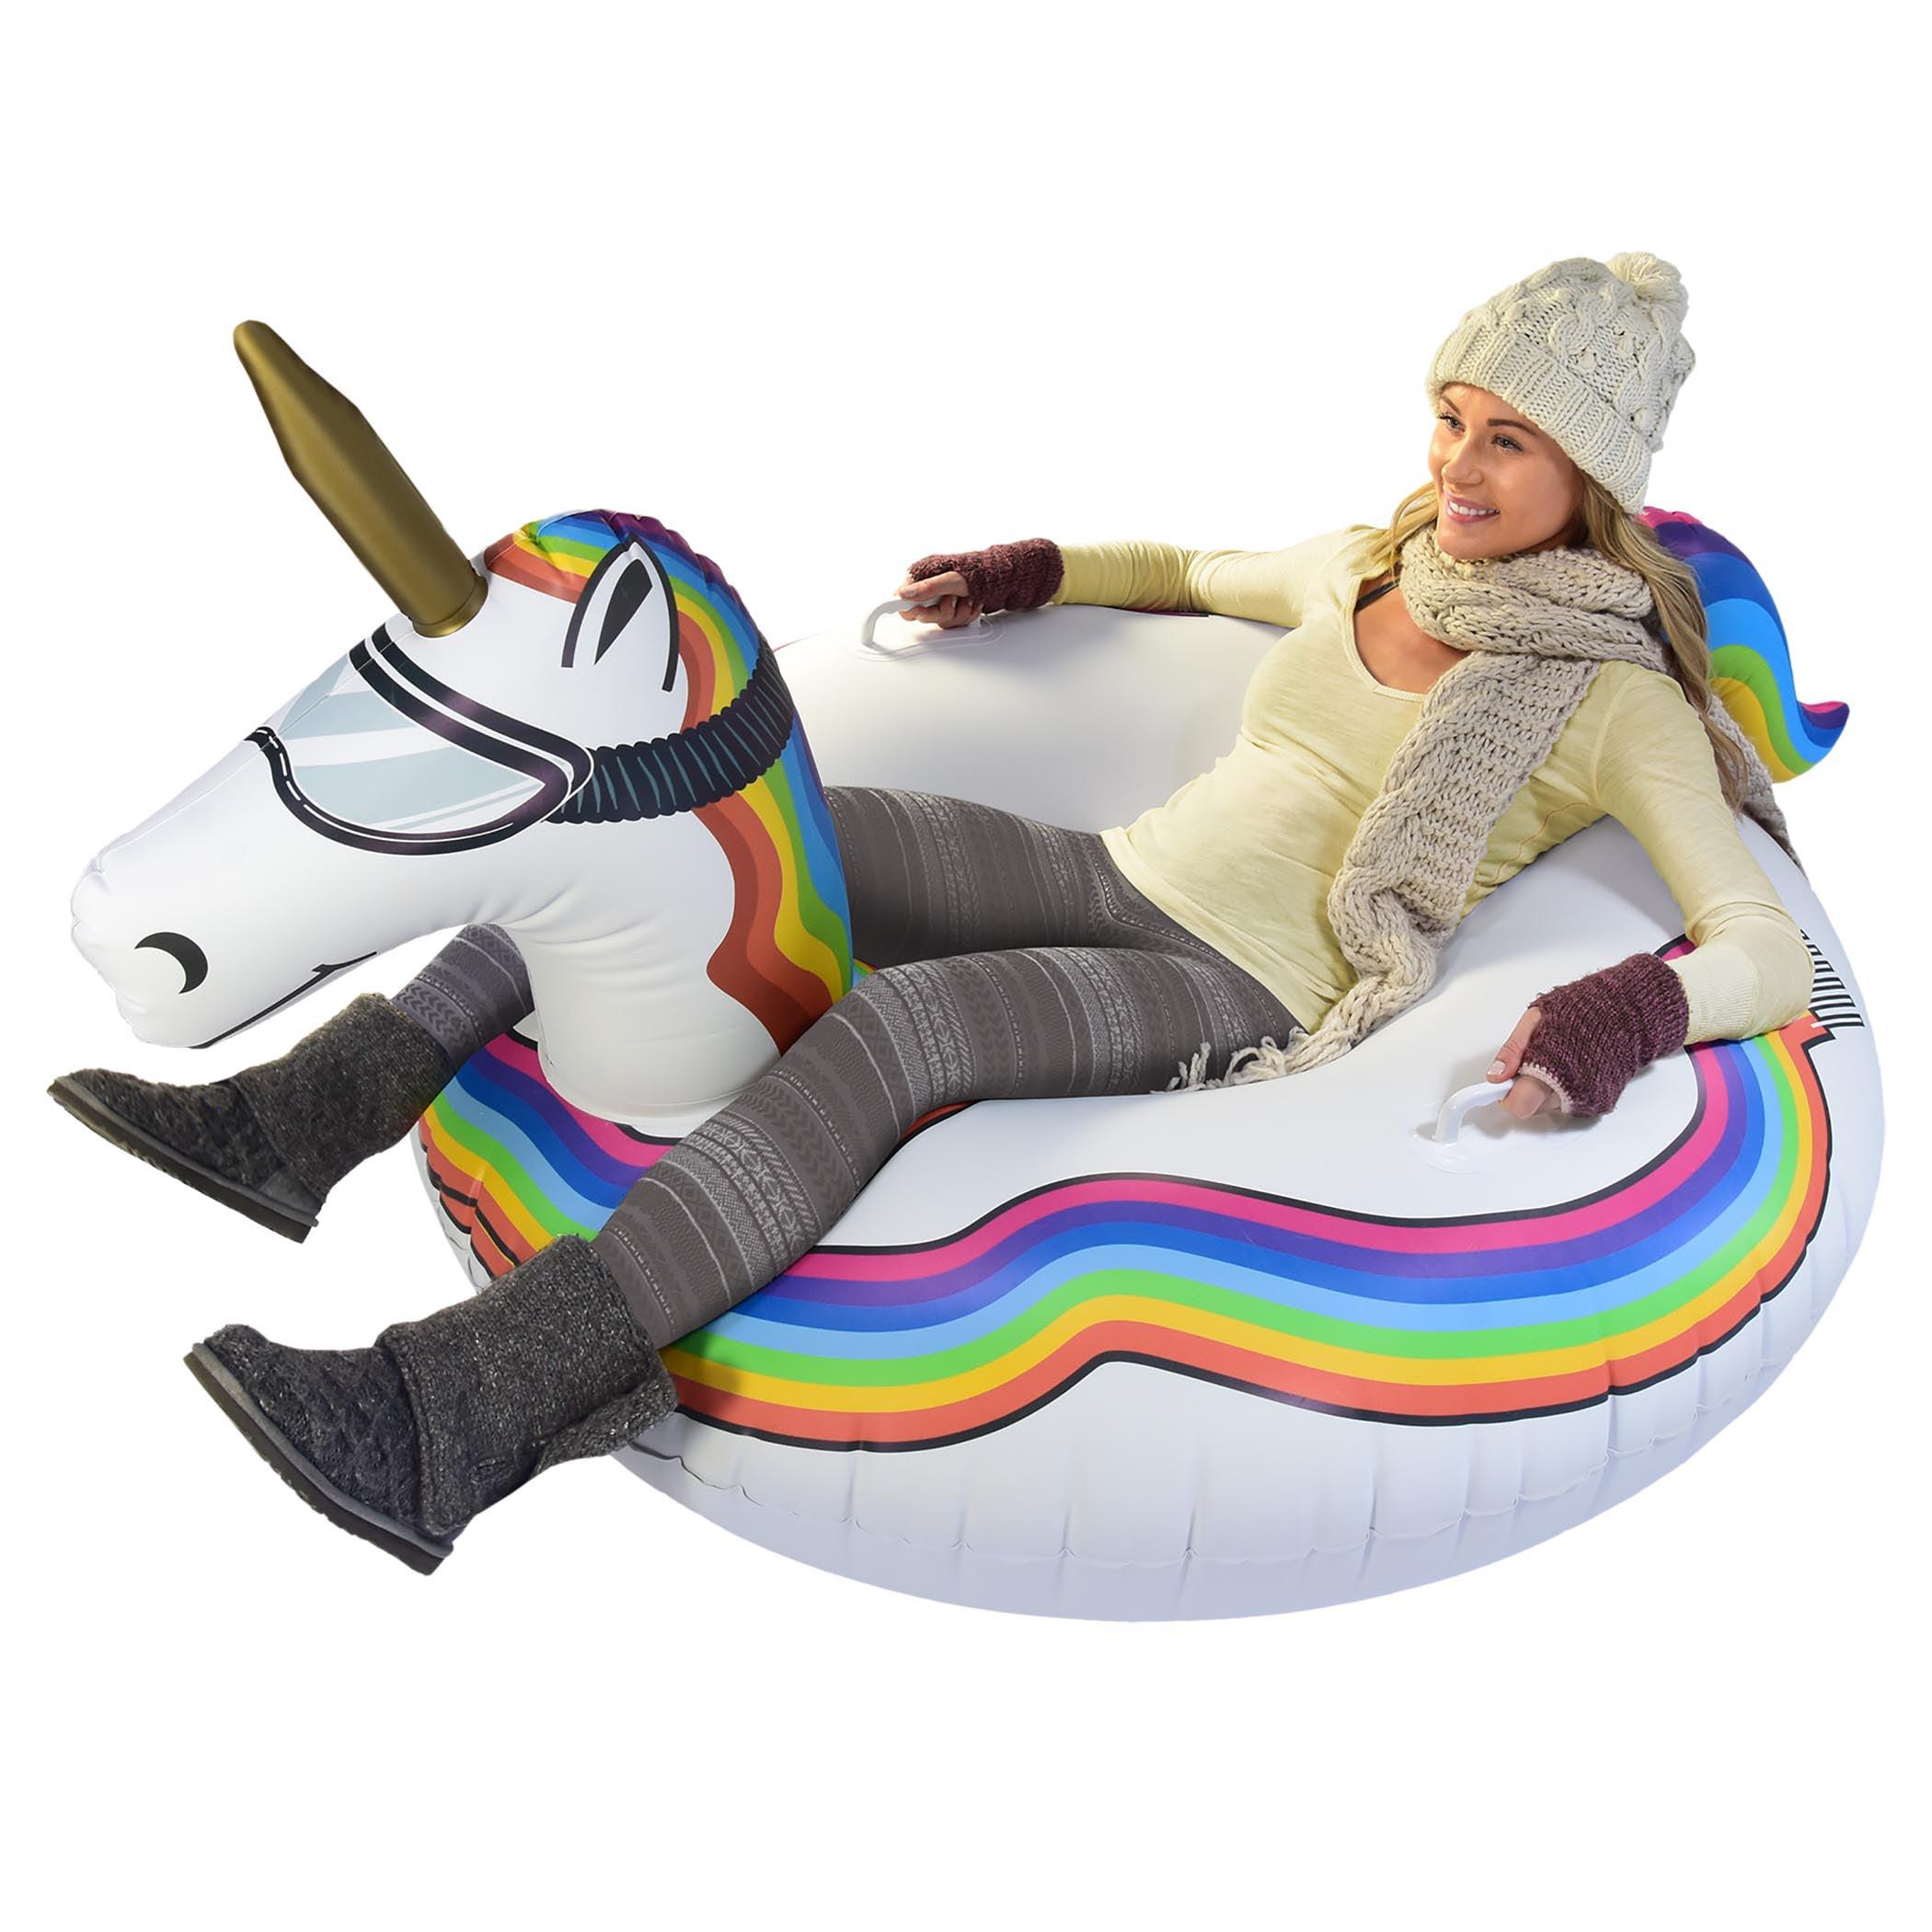 GoFloats Winter Snow Tube Unicorn The Ultimate Sled & Toboggan by P&P Imports; LLC